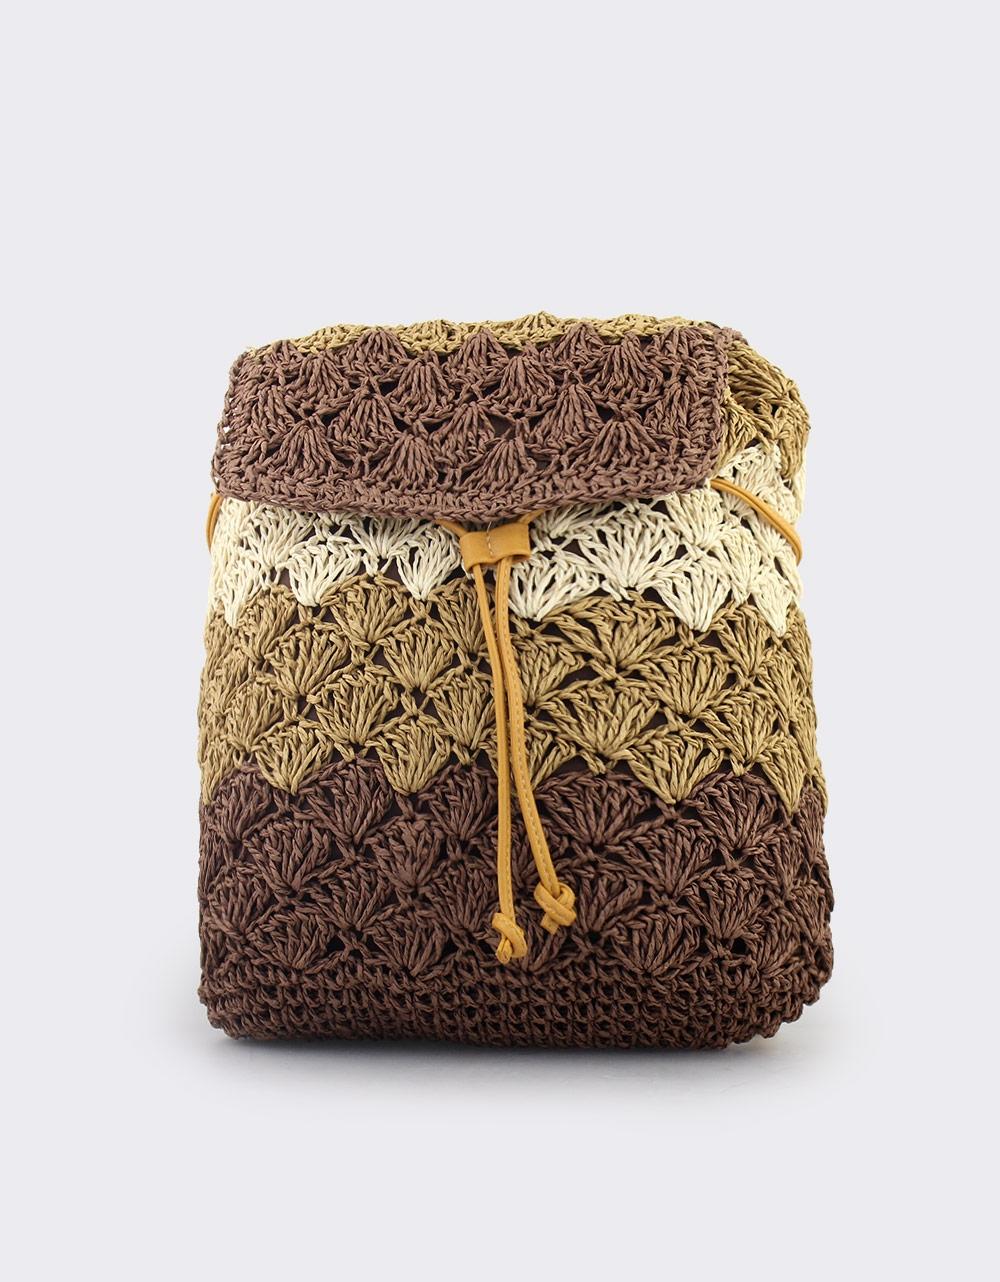 51bf653144 Εικόνα από Γυναικεία σακίδια πλάτης πλεκτά τρίχρωμα Καφέ